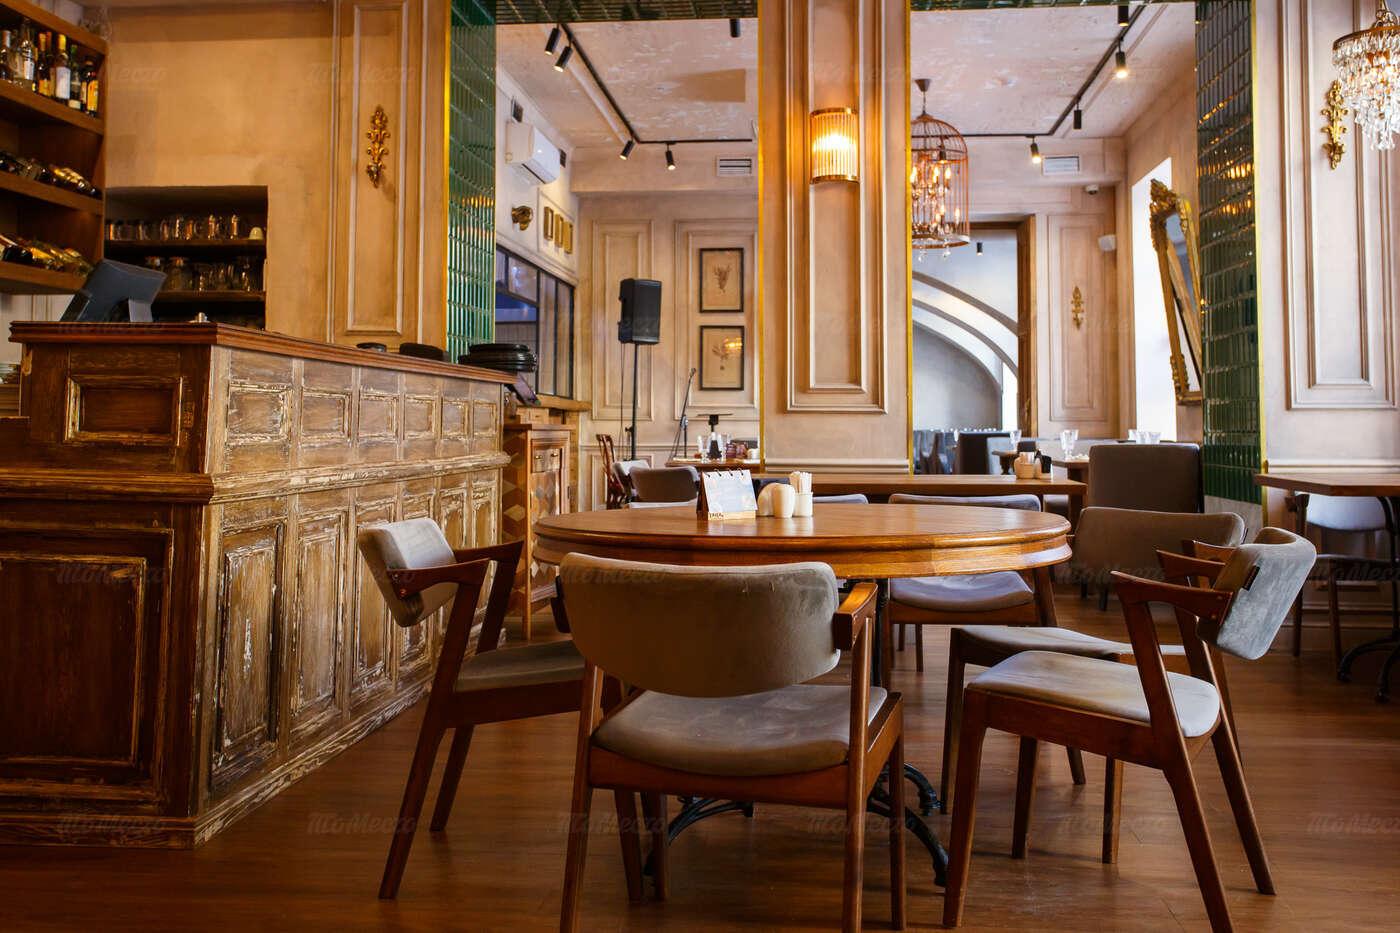 Ресторан Чача на набережной канала Грибоедова фото 8